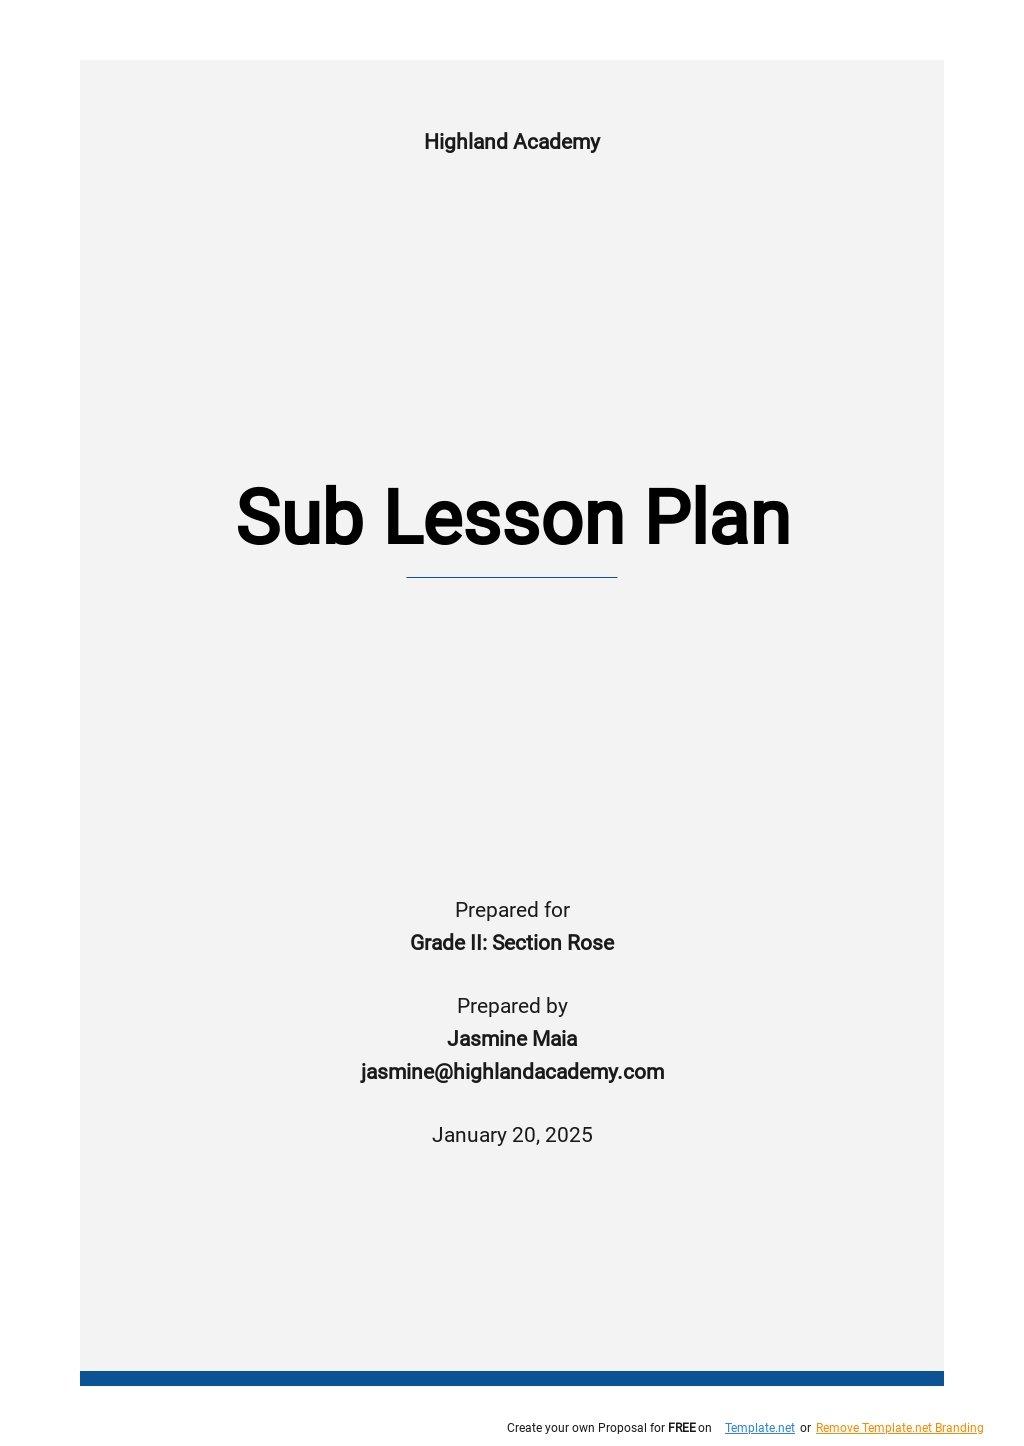 Free Sub Lesson Plan Template.jpe